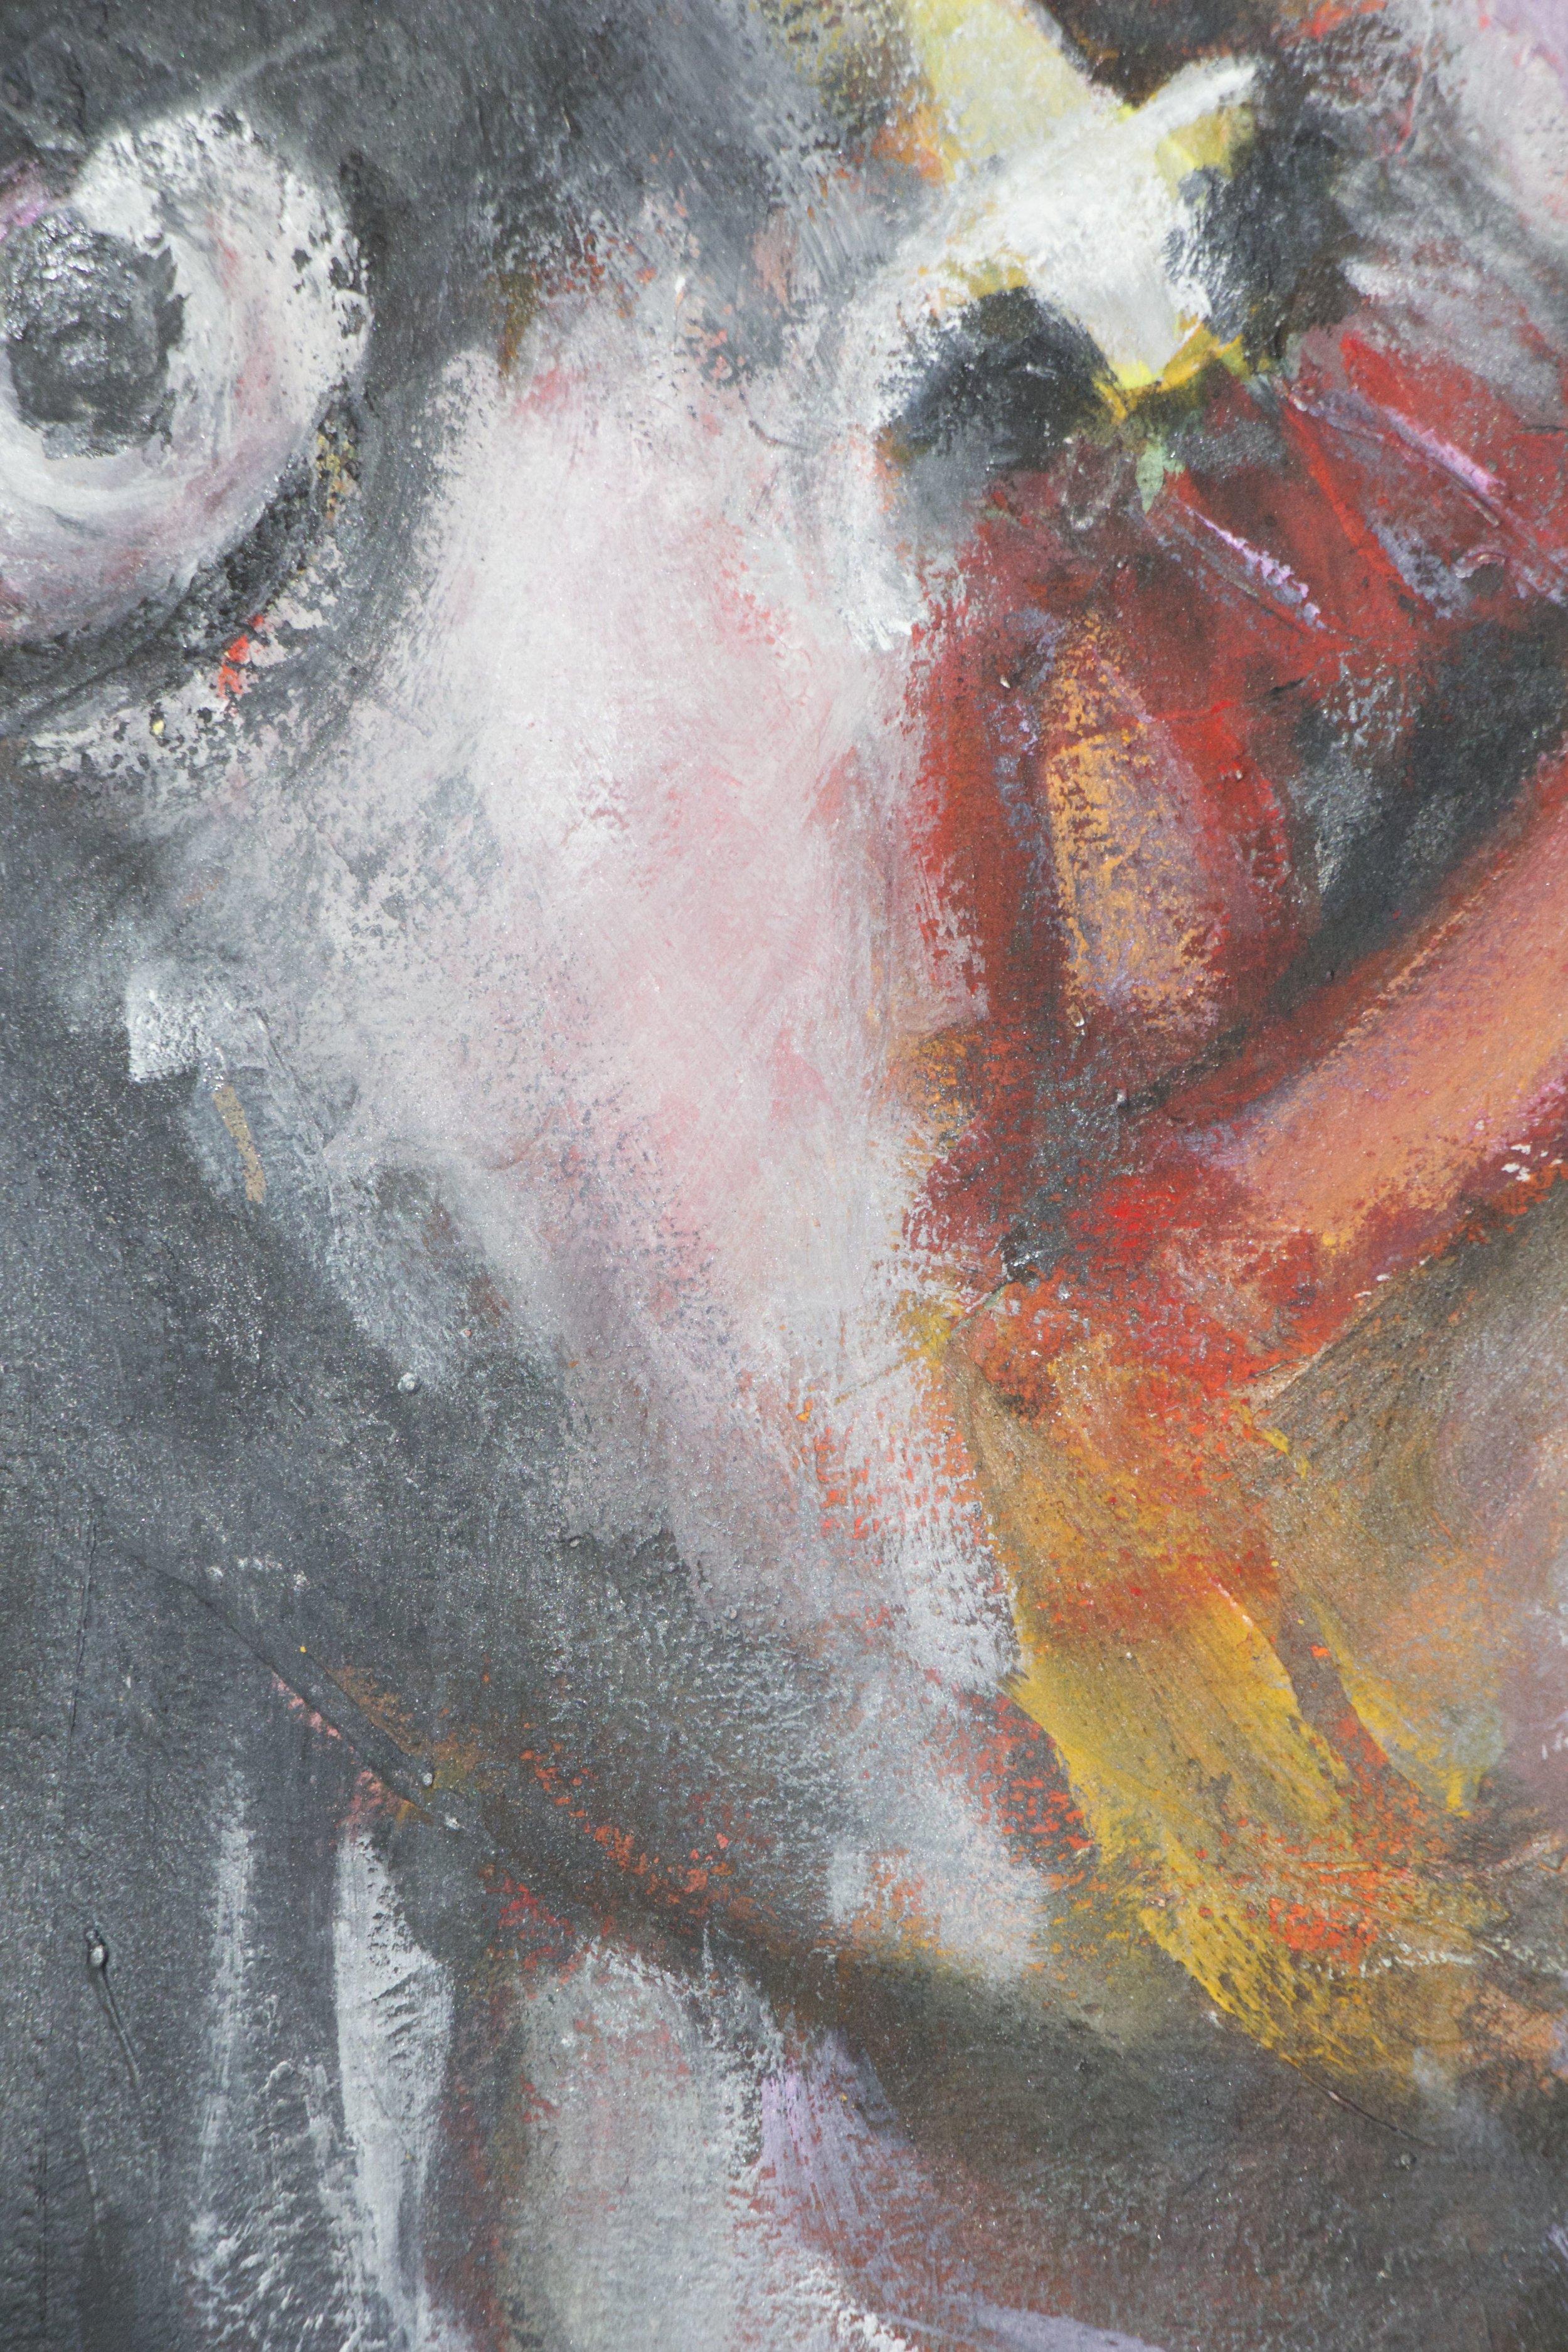 visage close up1.jpg